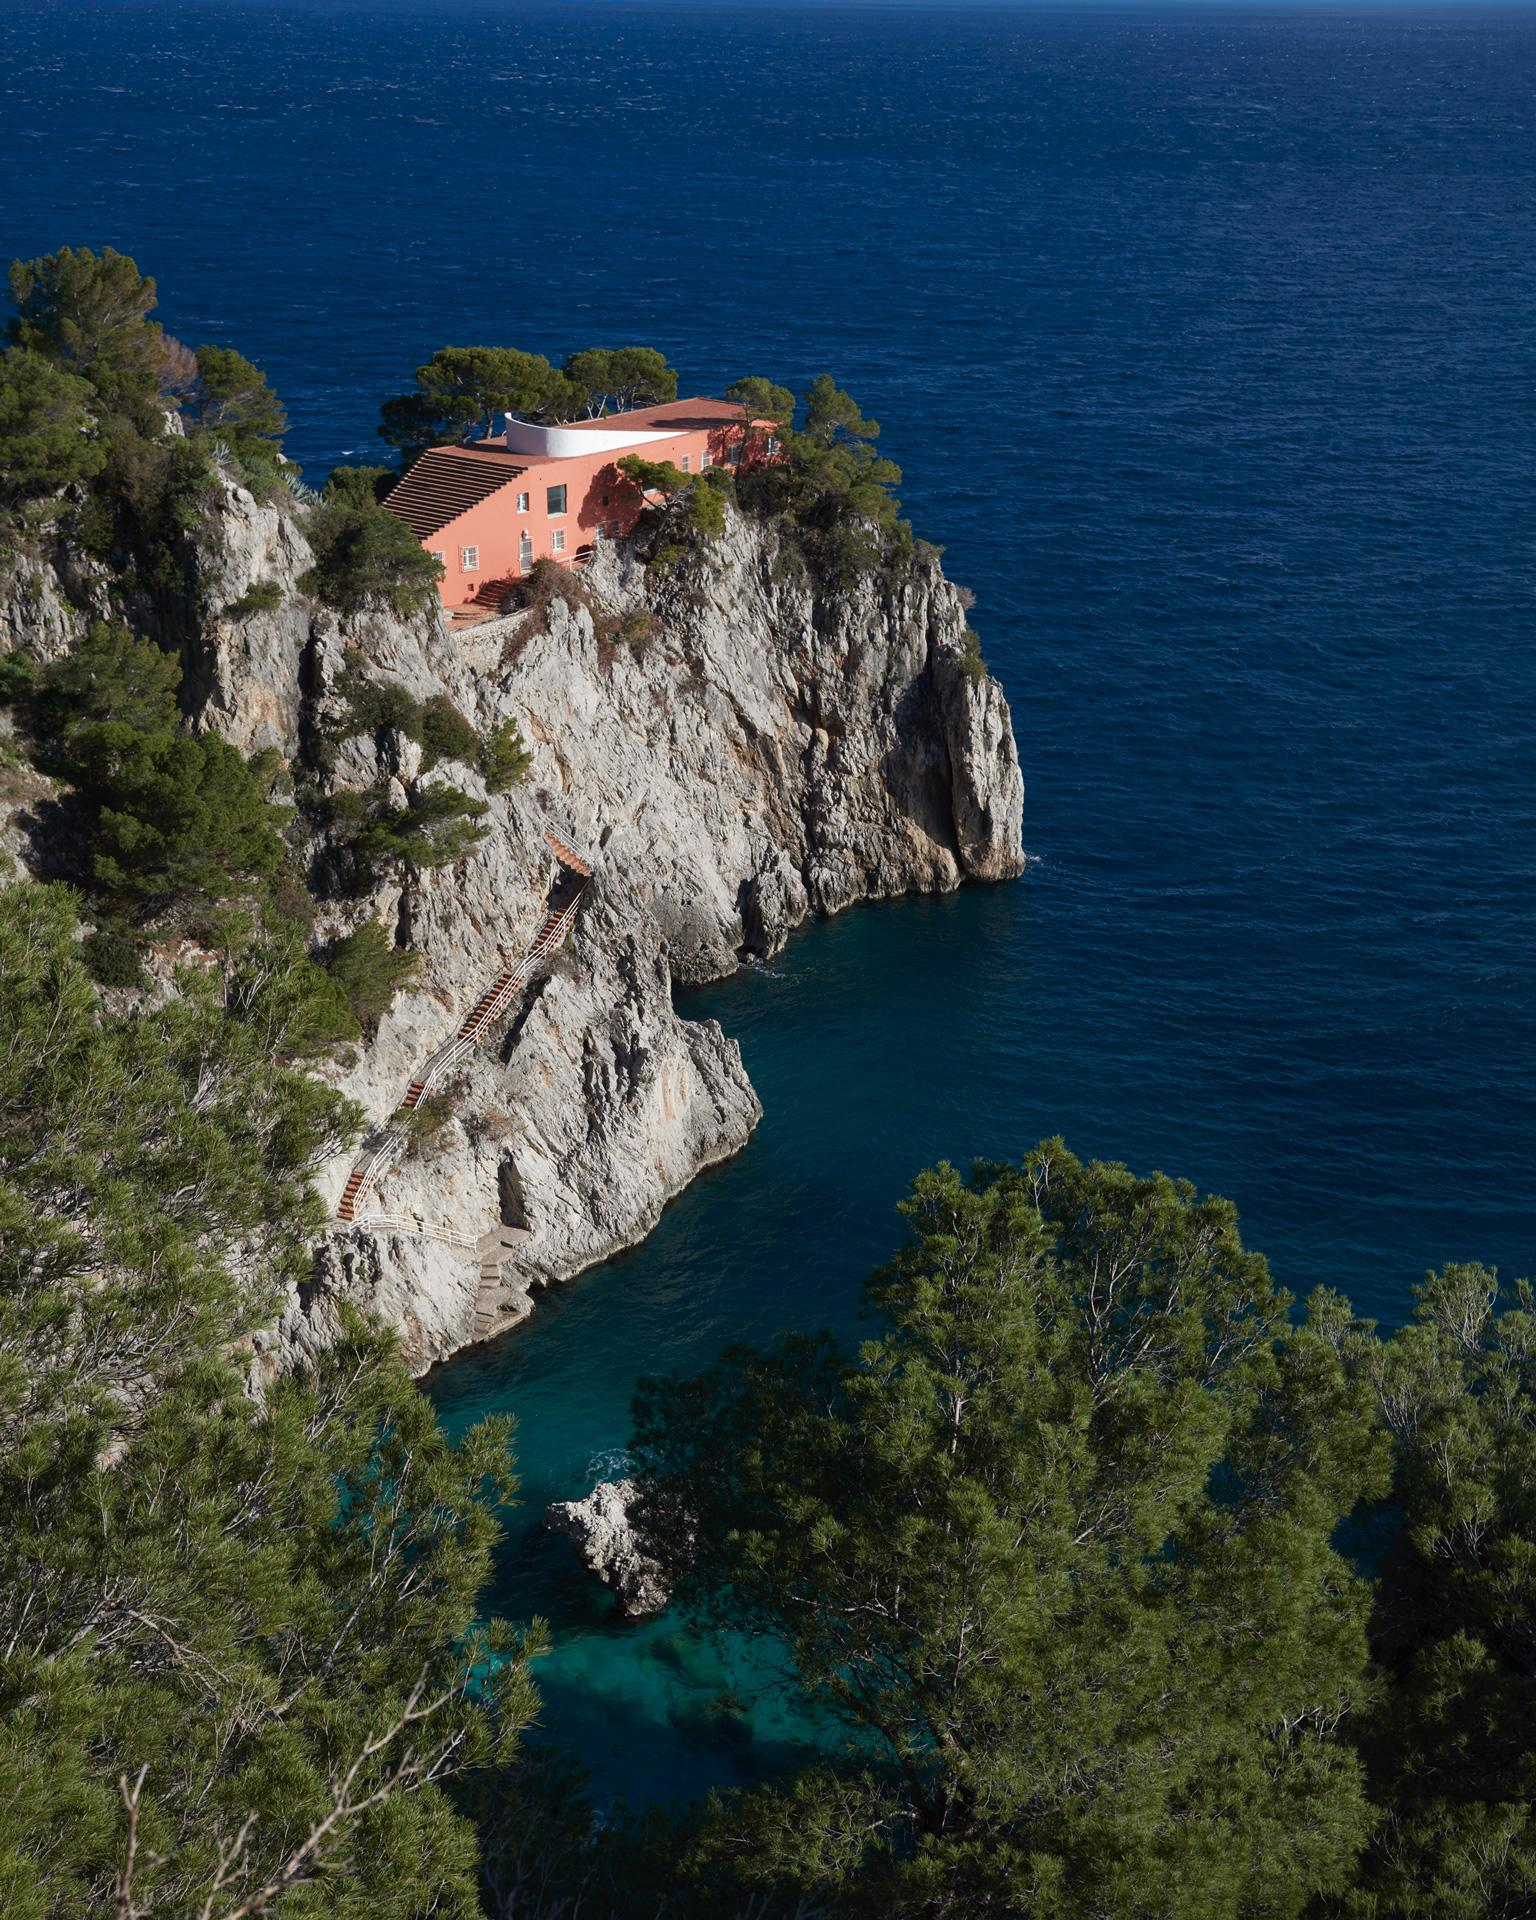 Casa Malaparte - large photograph of iconic Mediterranean villa on Capri island